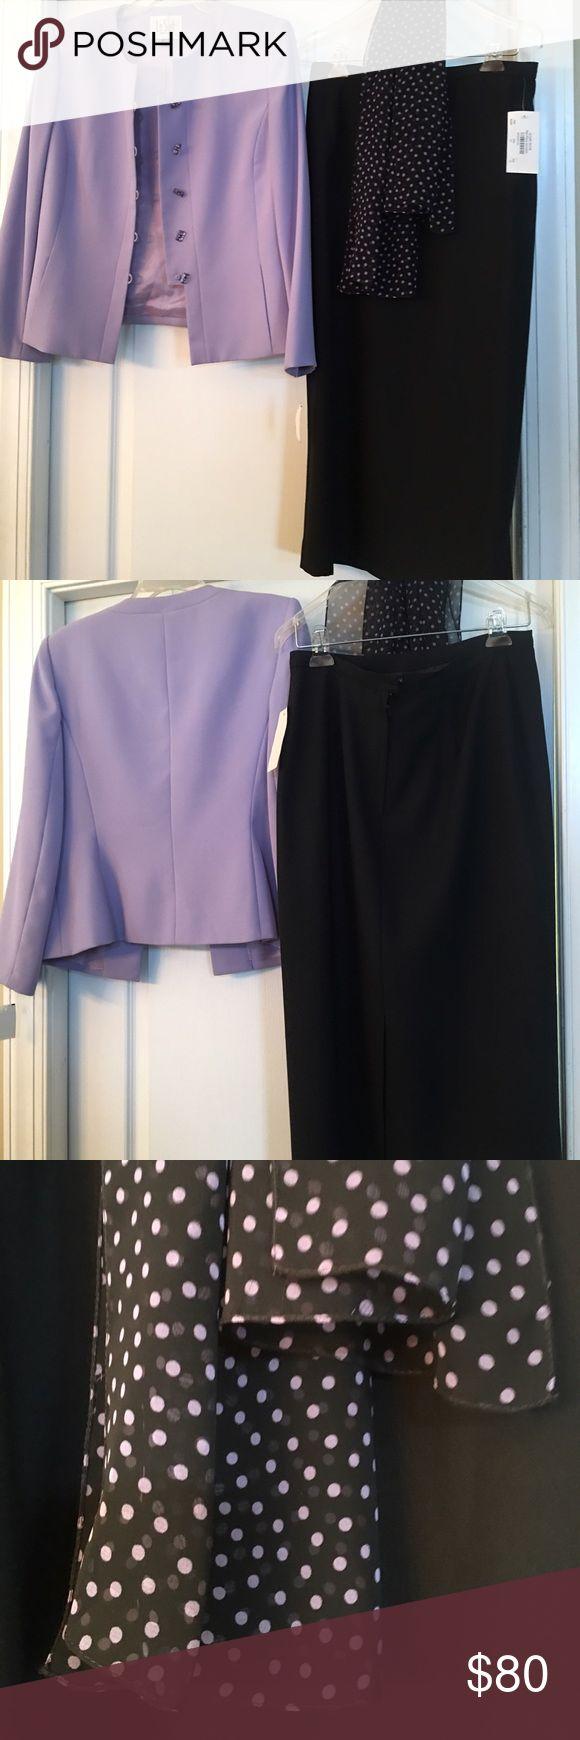 Le Suit suit petite suit. jacket & skirt, scarf Le Suit petite, lavender jacket, black skirt and matching scarf Le Suit Skirts A-Line or Full